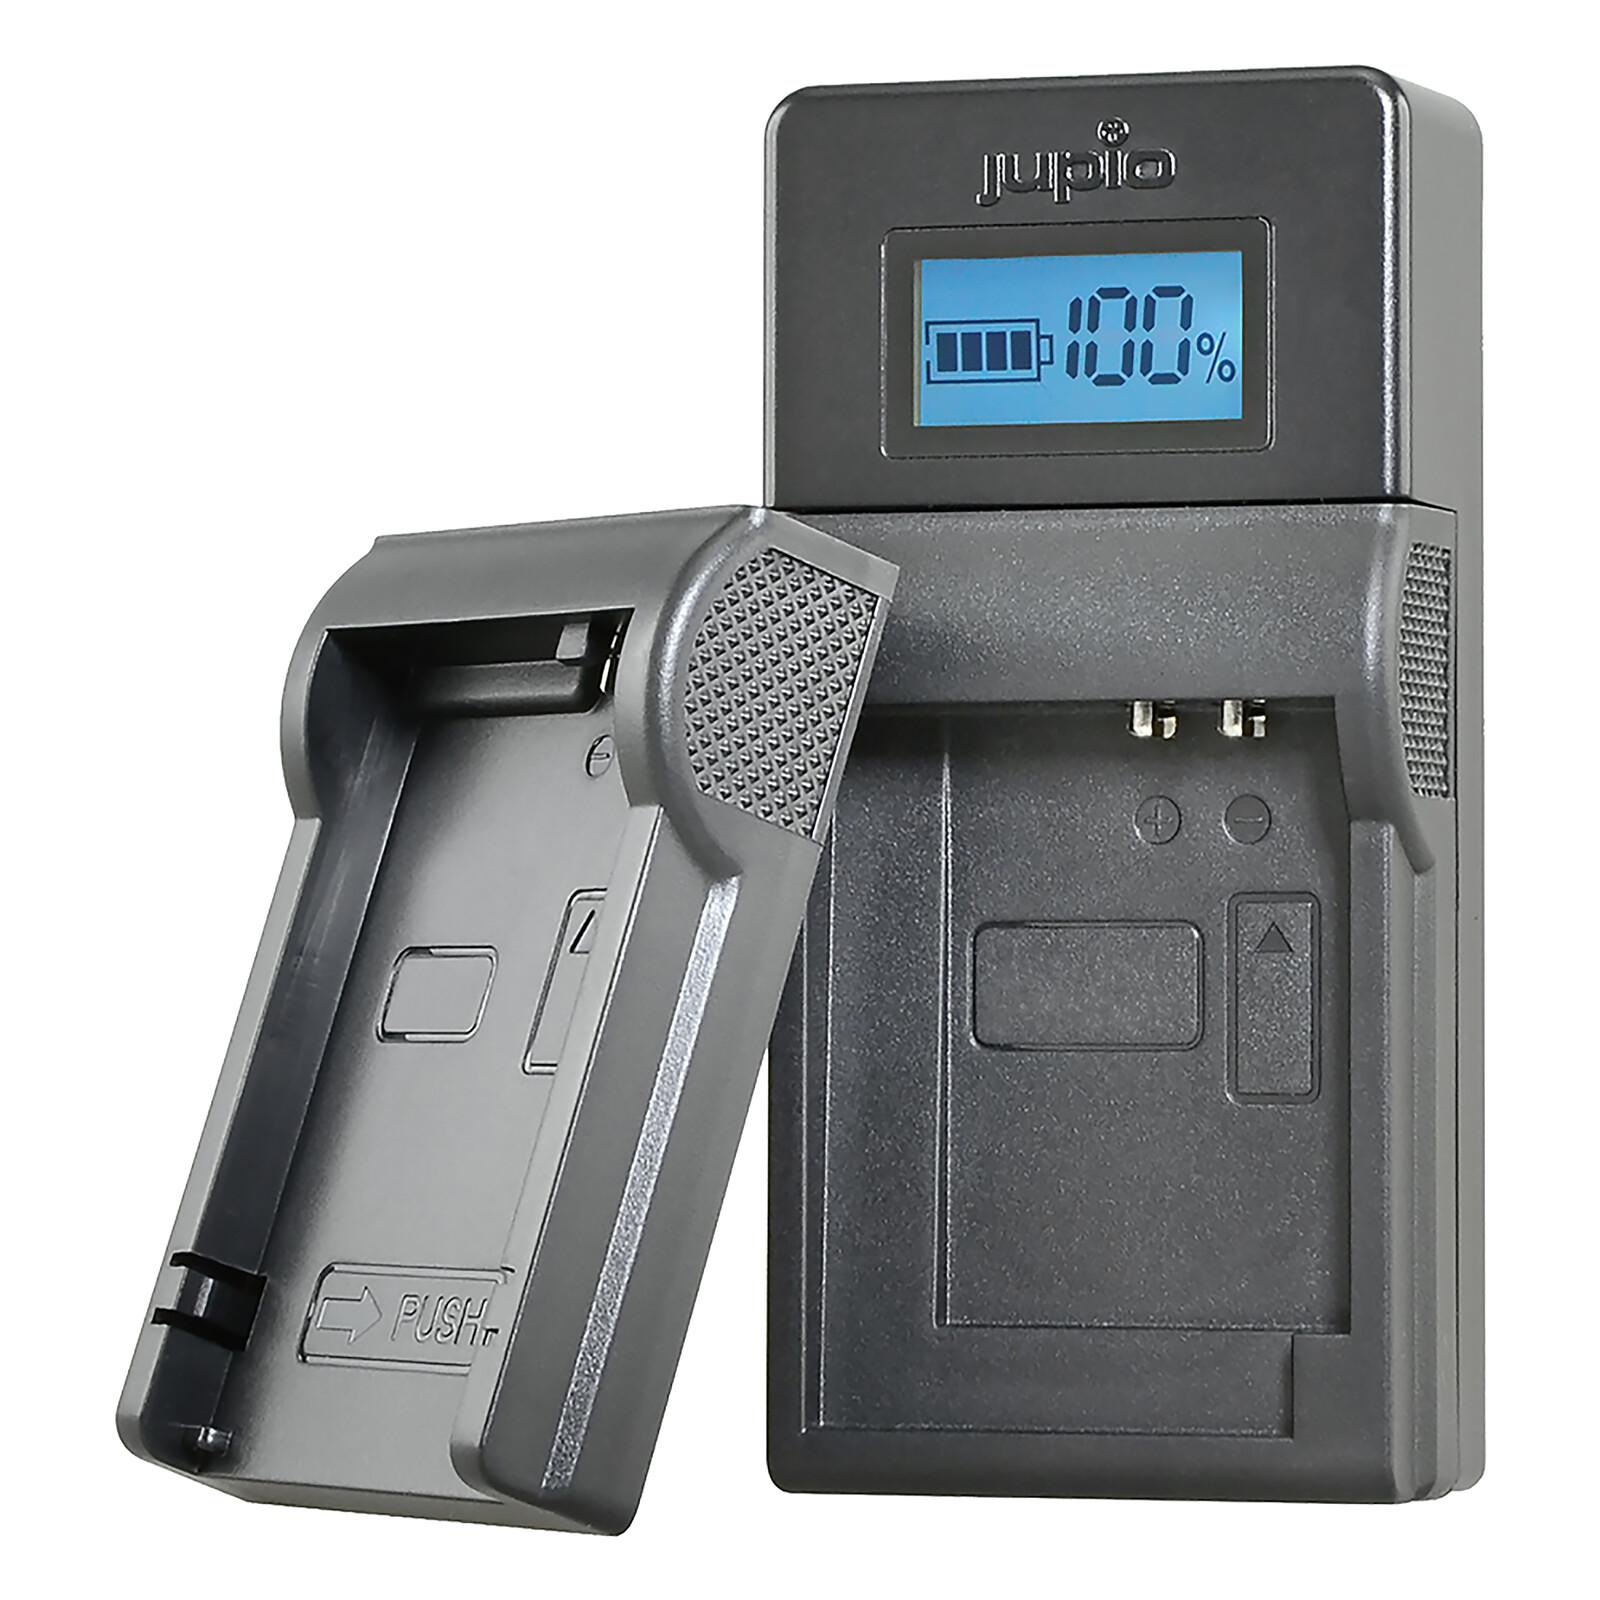 Jupio Brand Charger für Canon 7.2-8.4V Akkus